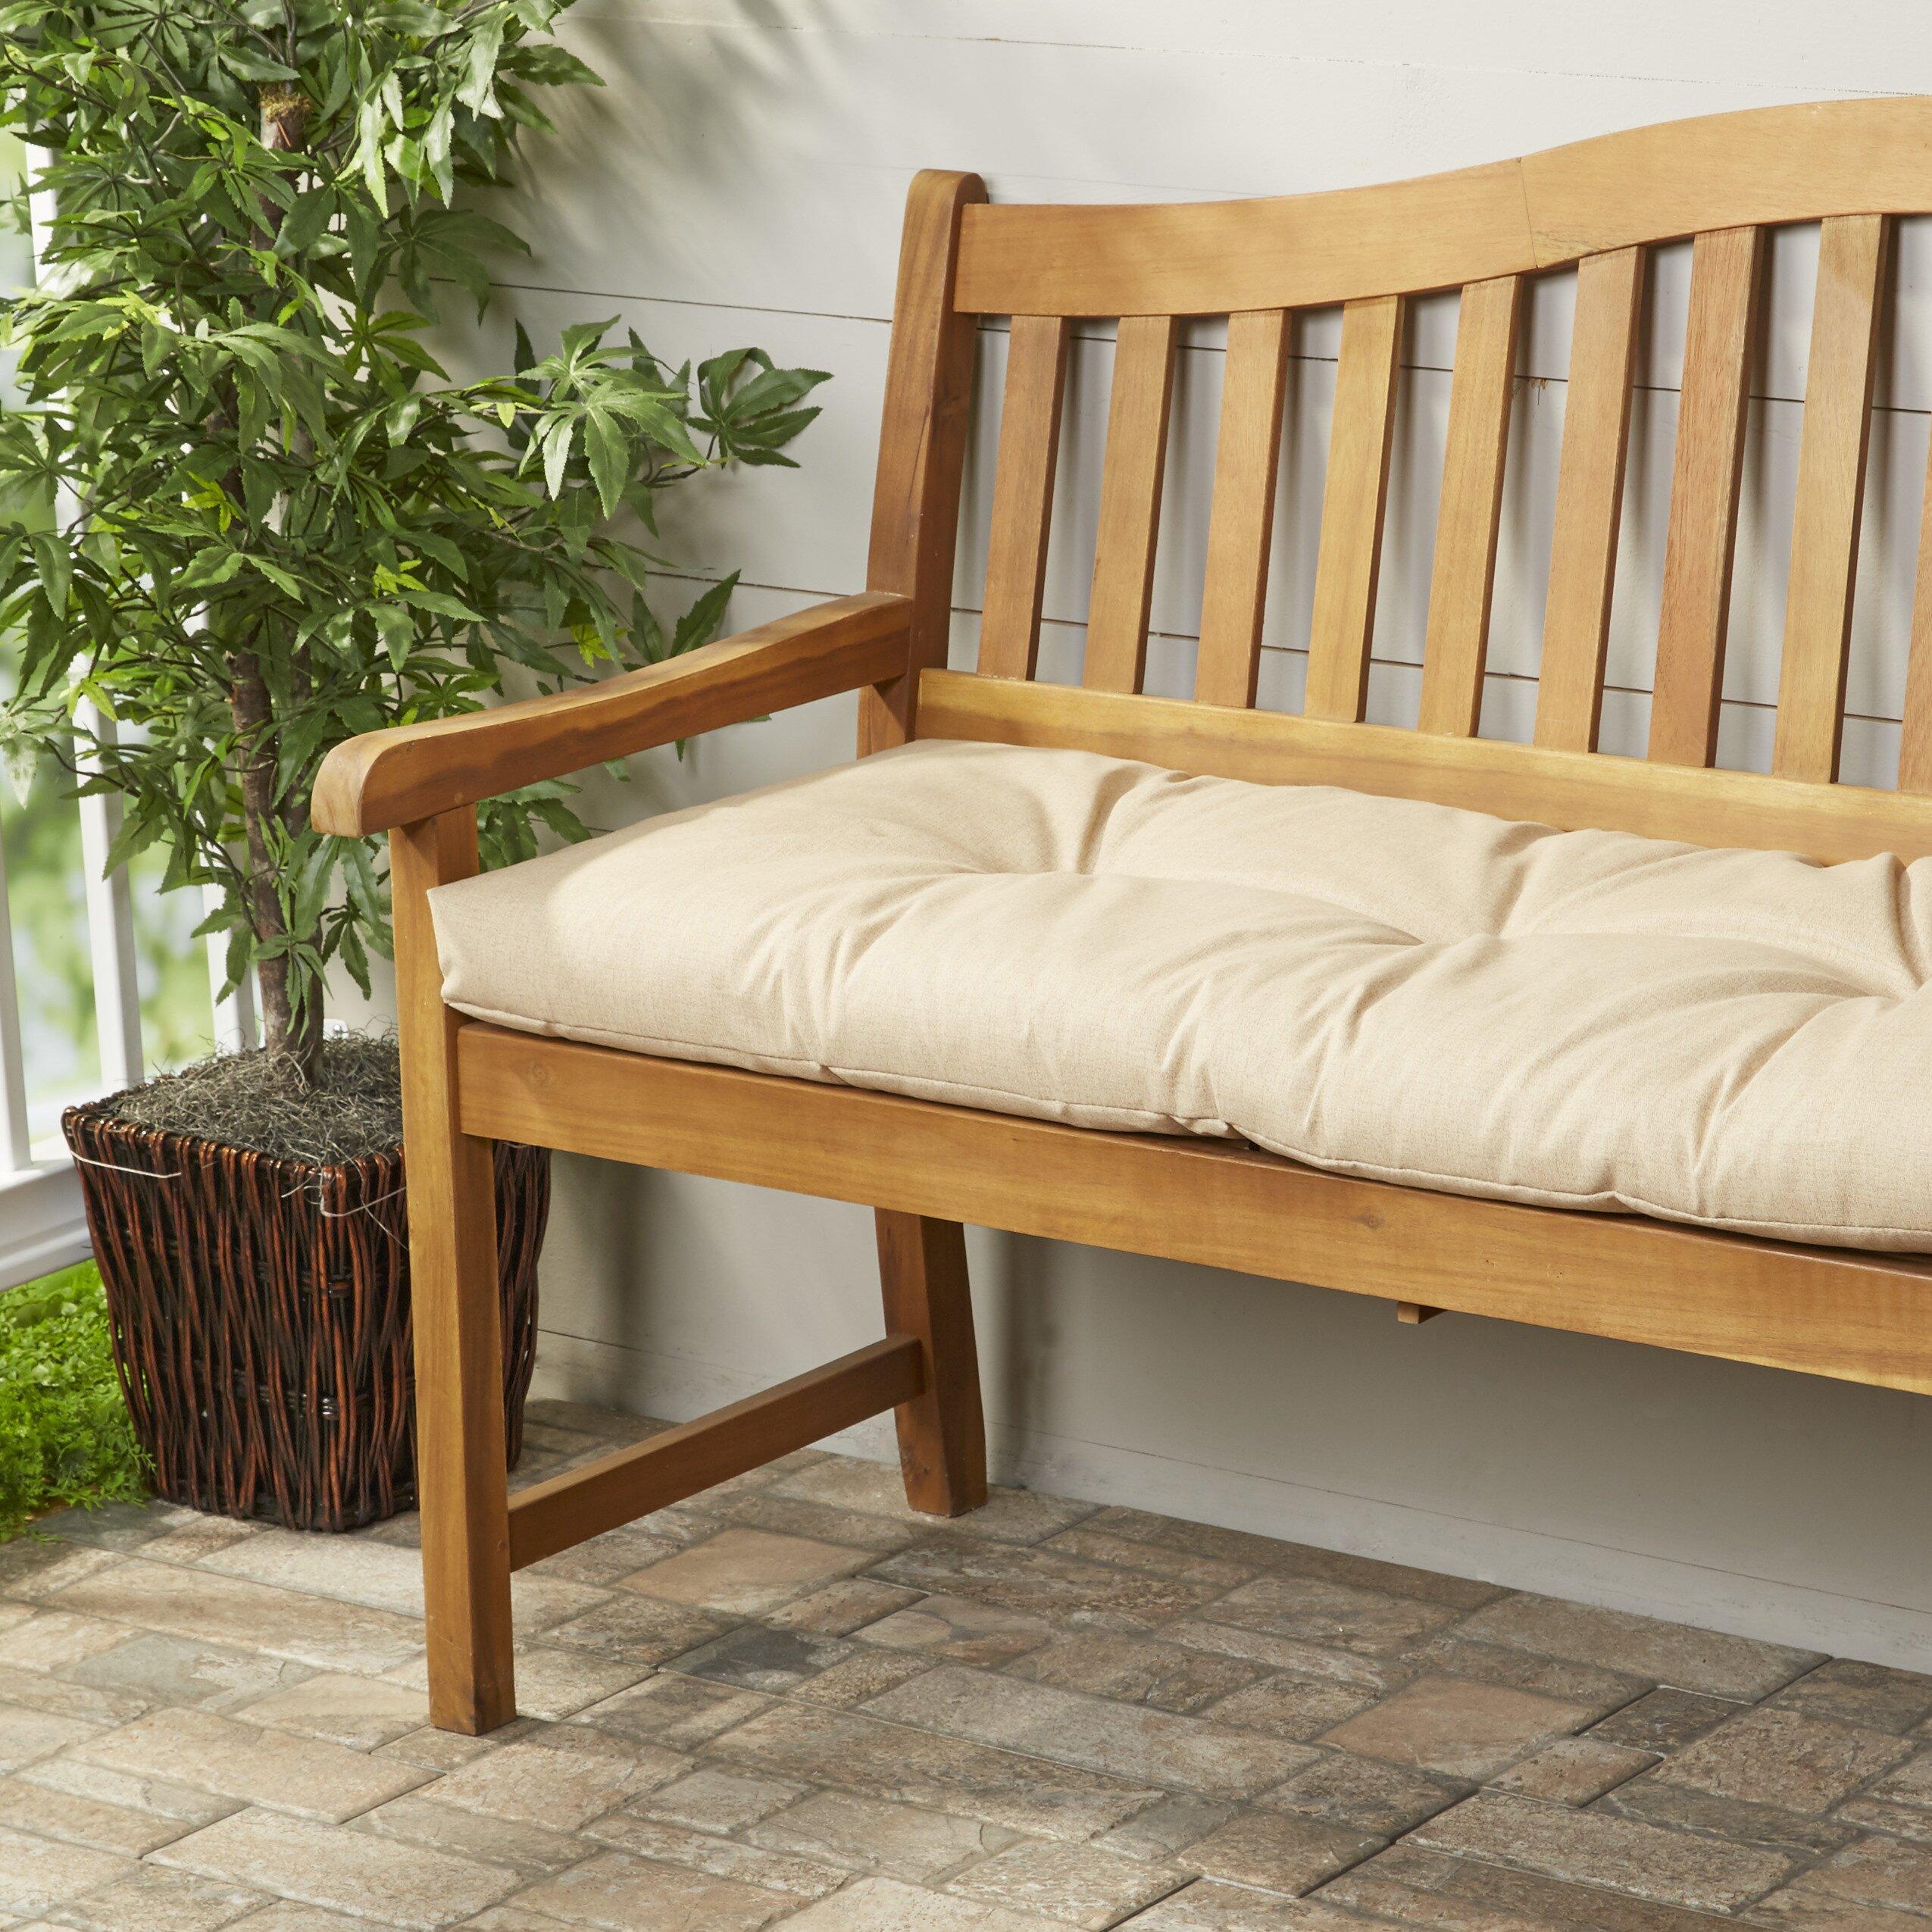 Wayfair Basics Wayfair Basics Outdoor Bench Cushion